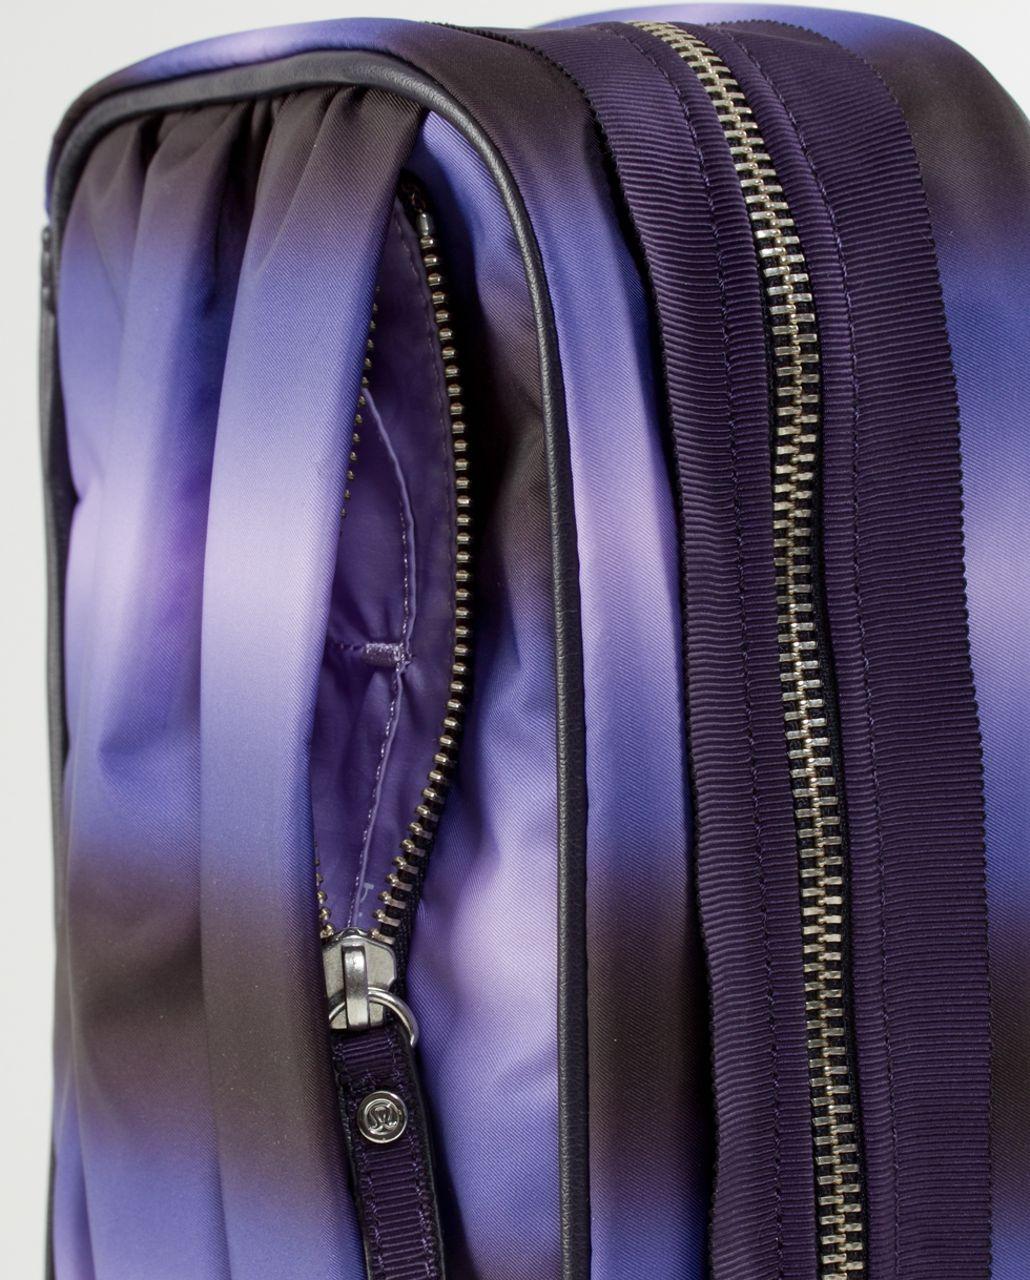 Lululemon Gym Essentials Kit - Black Swan Persian Purple Lilac Gradient